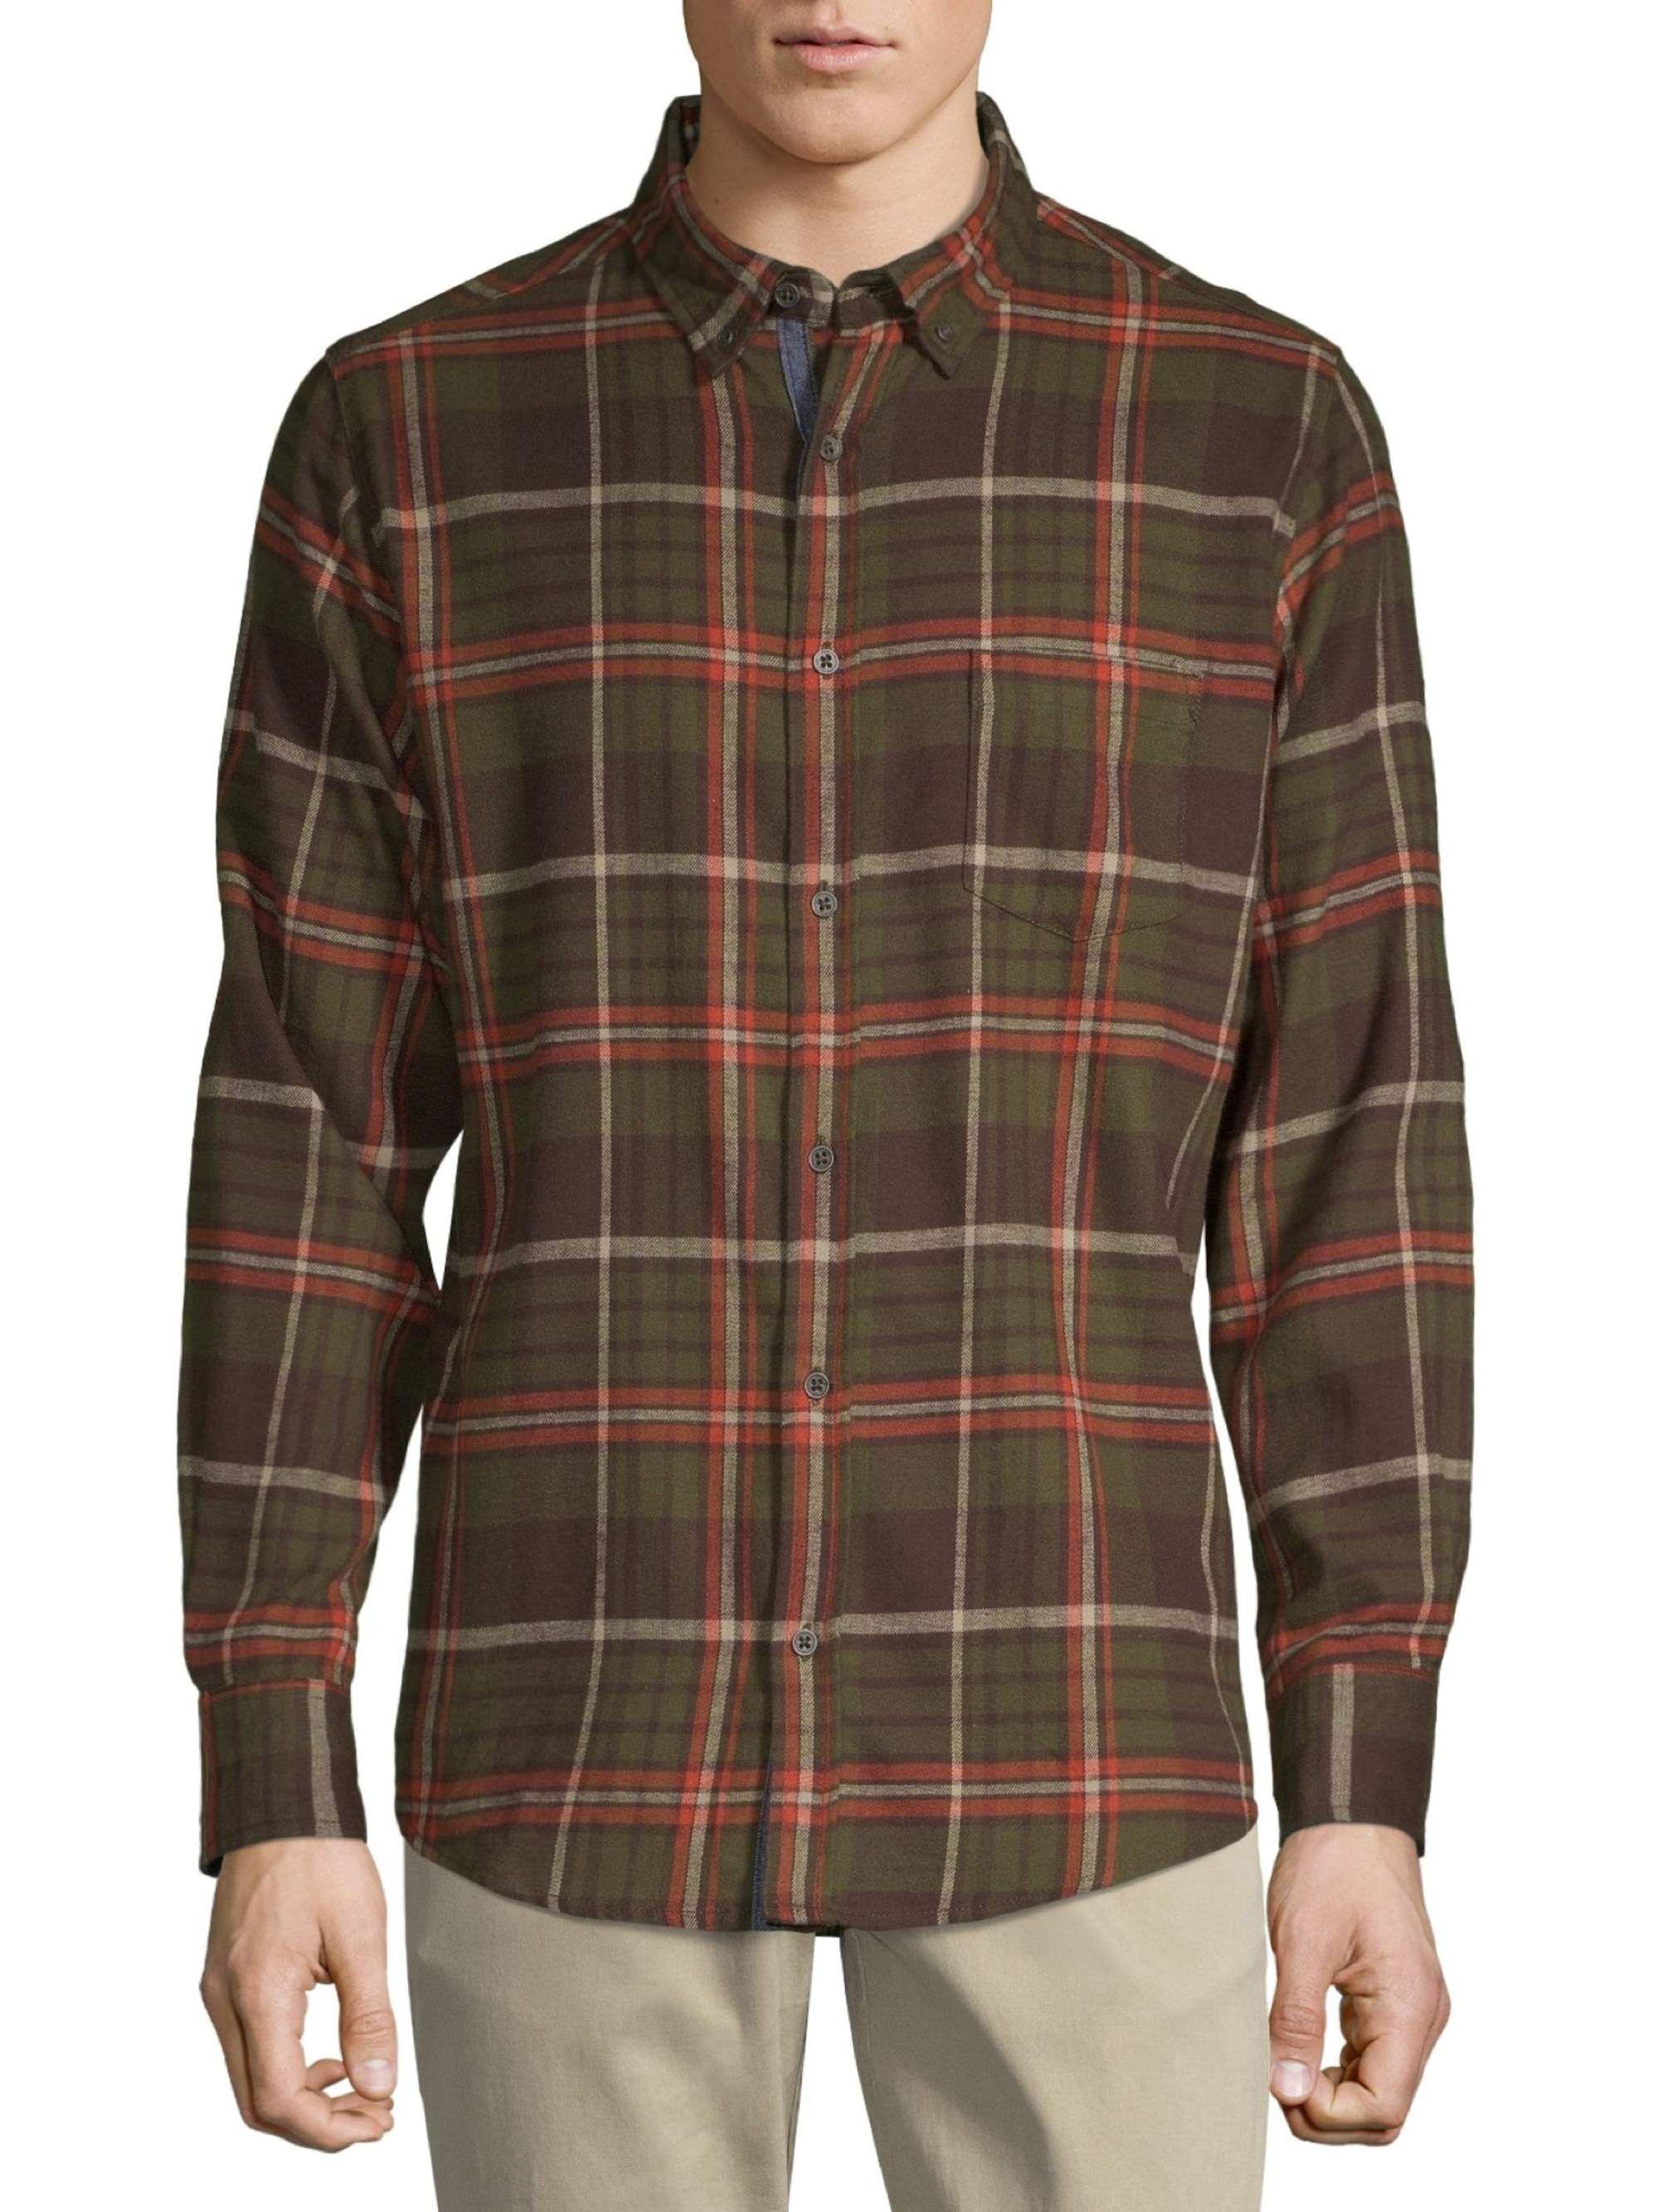 One Day Away One Day Away Men S Long Sleeve Brushed Flannel Shirt Walmart Com Flannel Shirt Mens Long Sleeve Plaid Shirt Men [ 2667 x 2000 Pixel ]